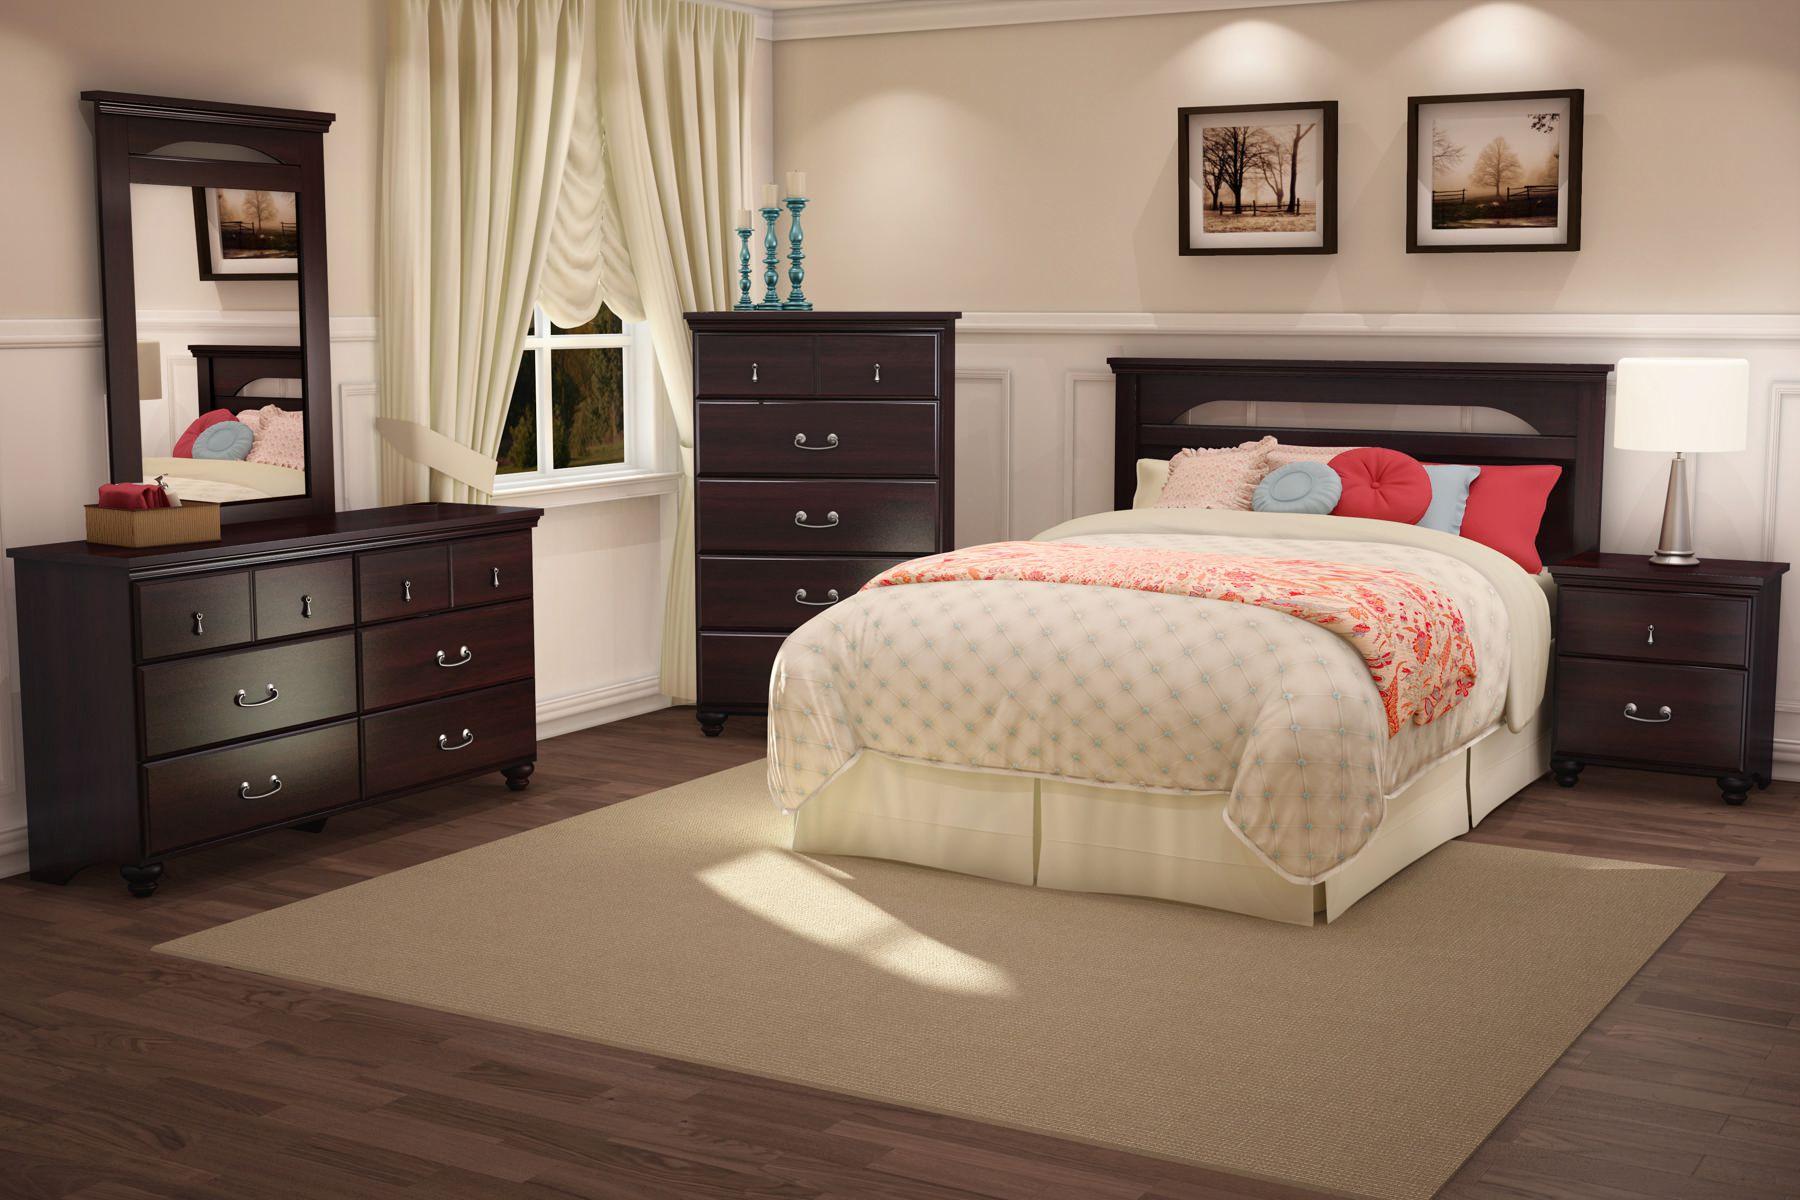 Affordable bedroom sets candice olson bedroom furniture for Cheap modern furniture adelaide